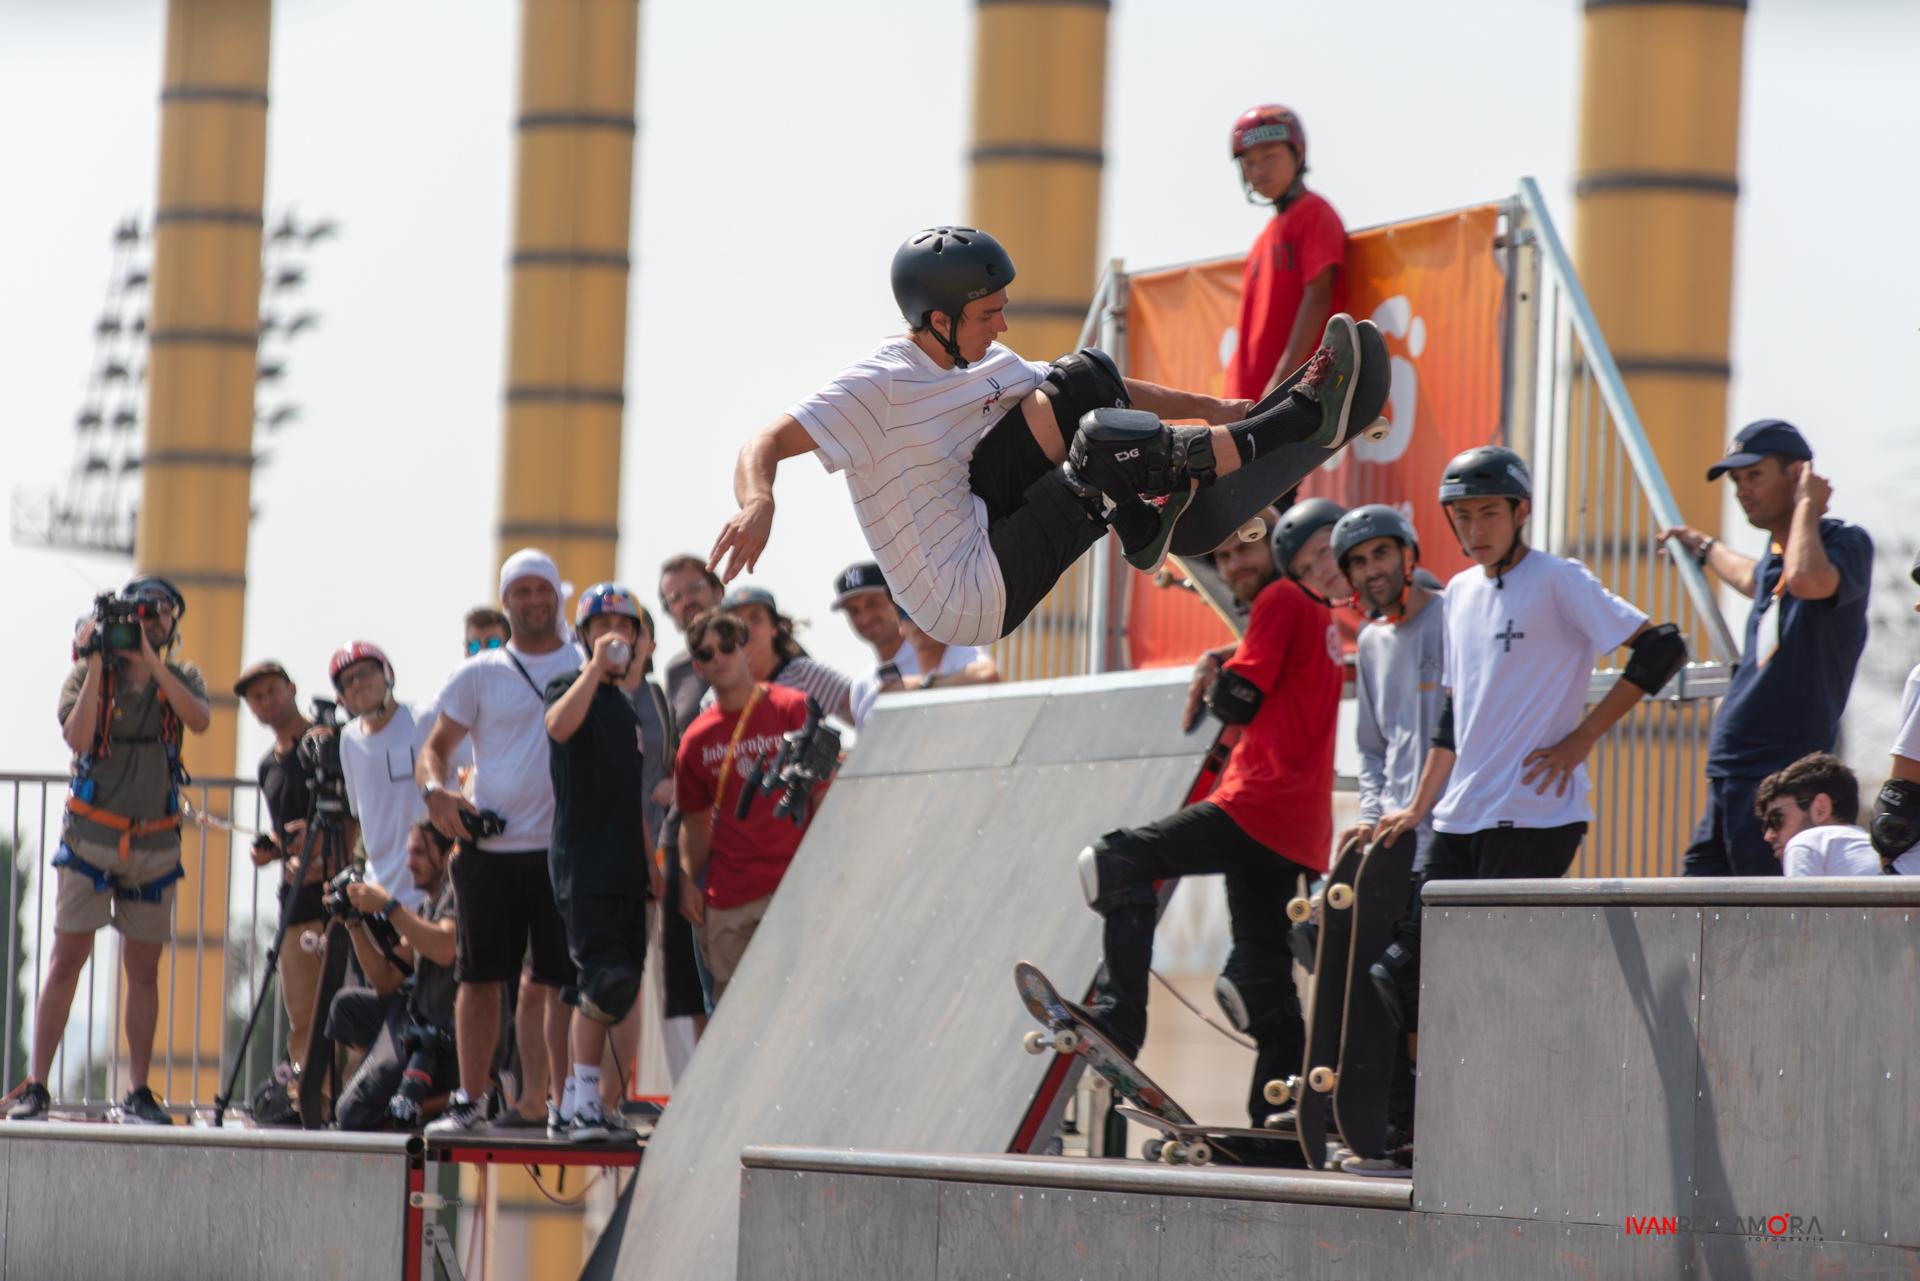 skateboard half